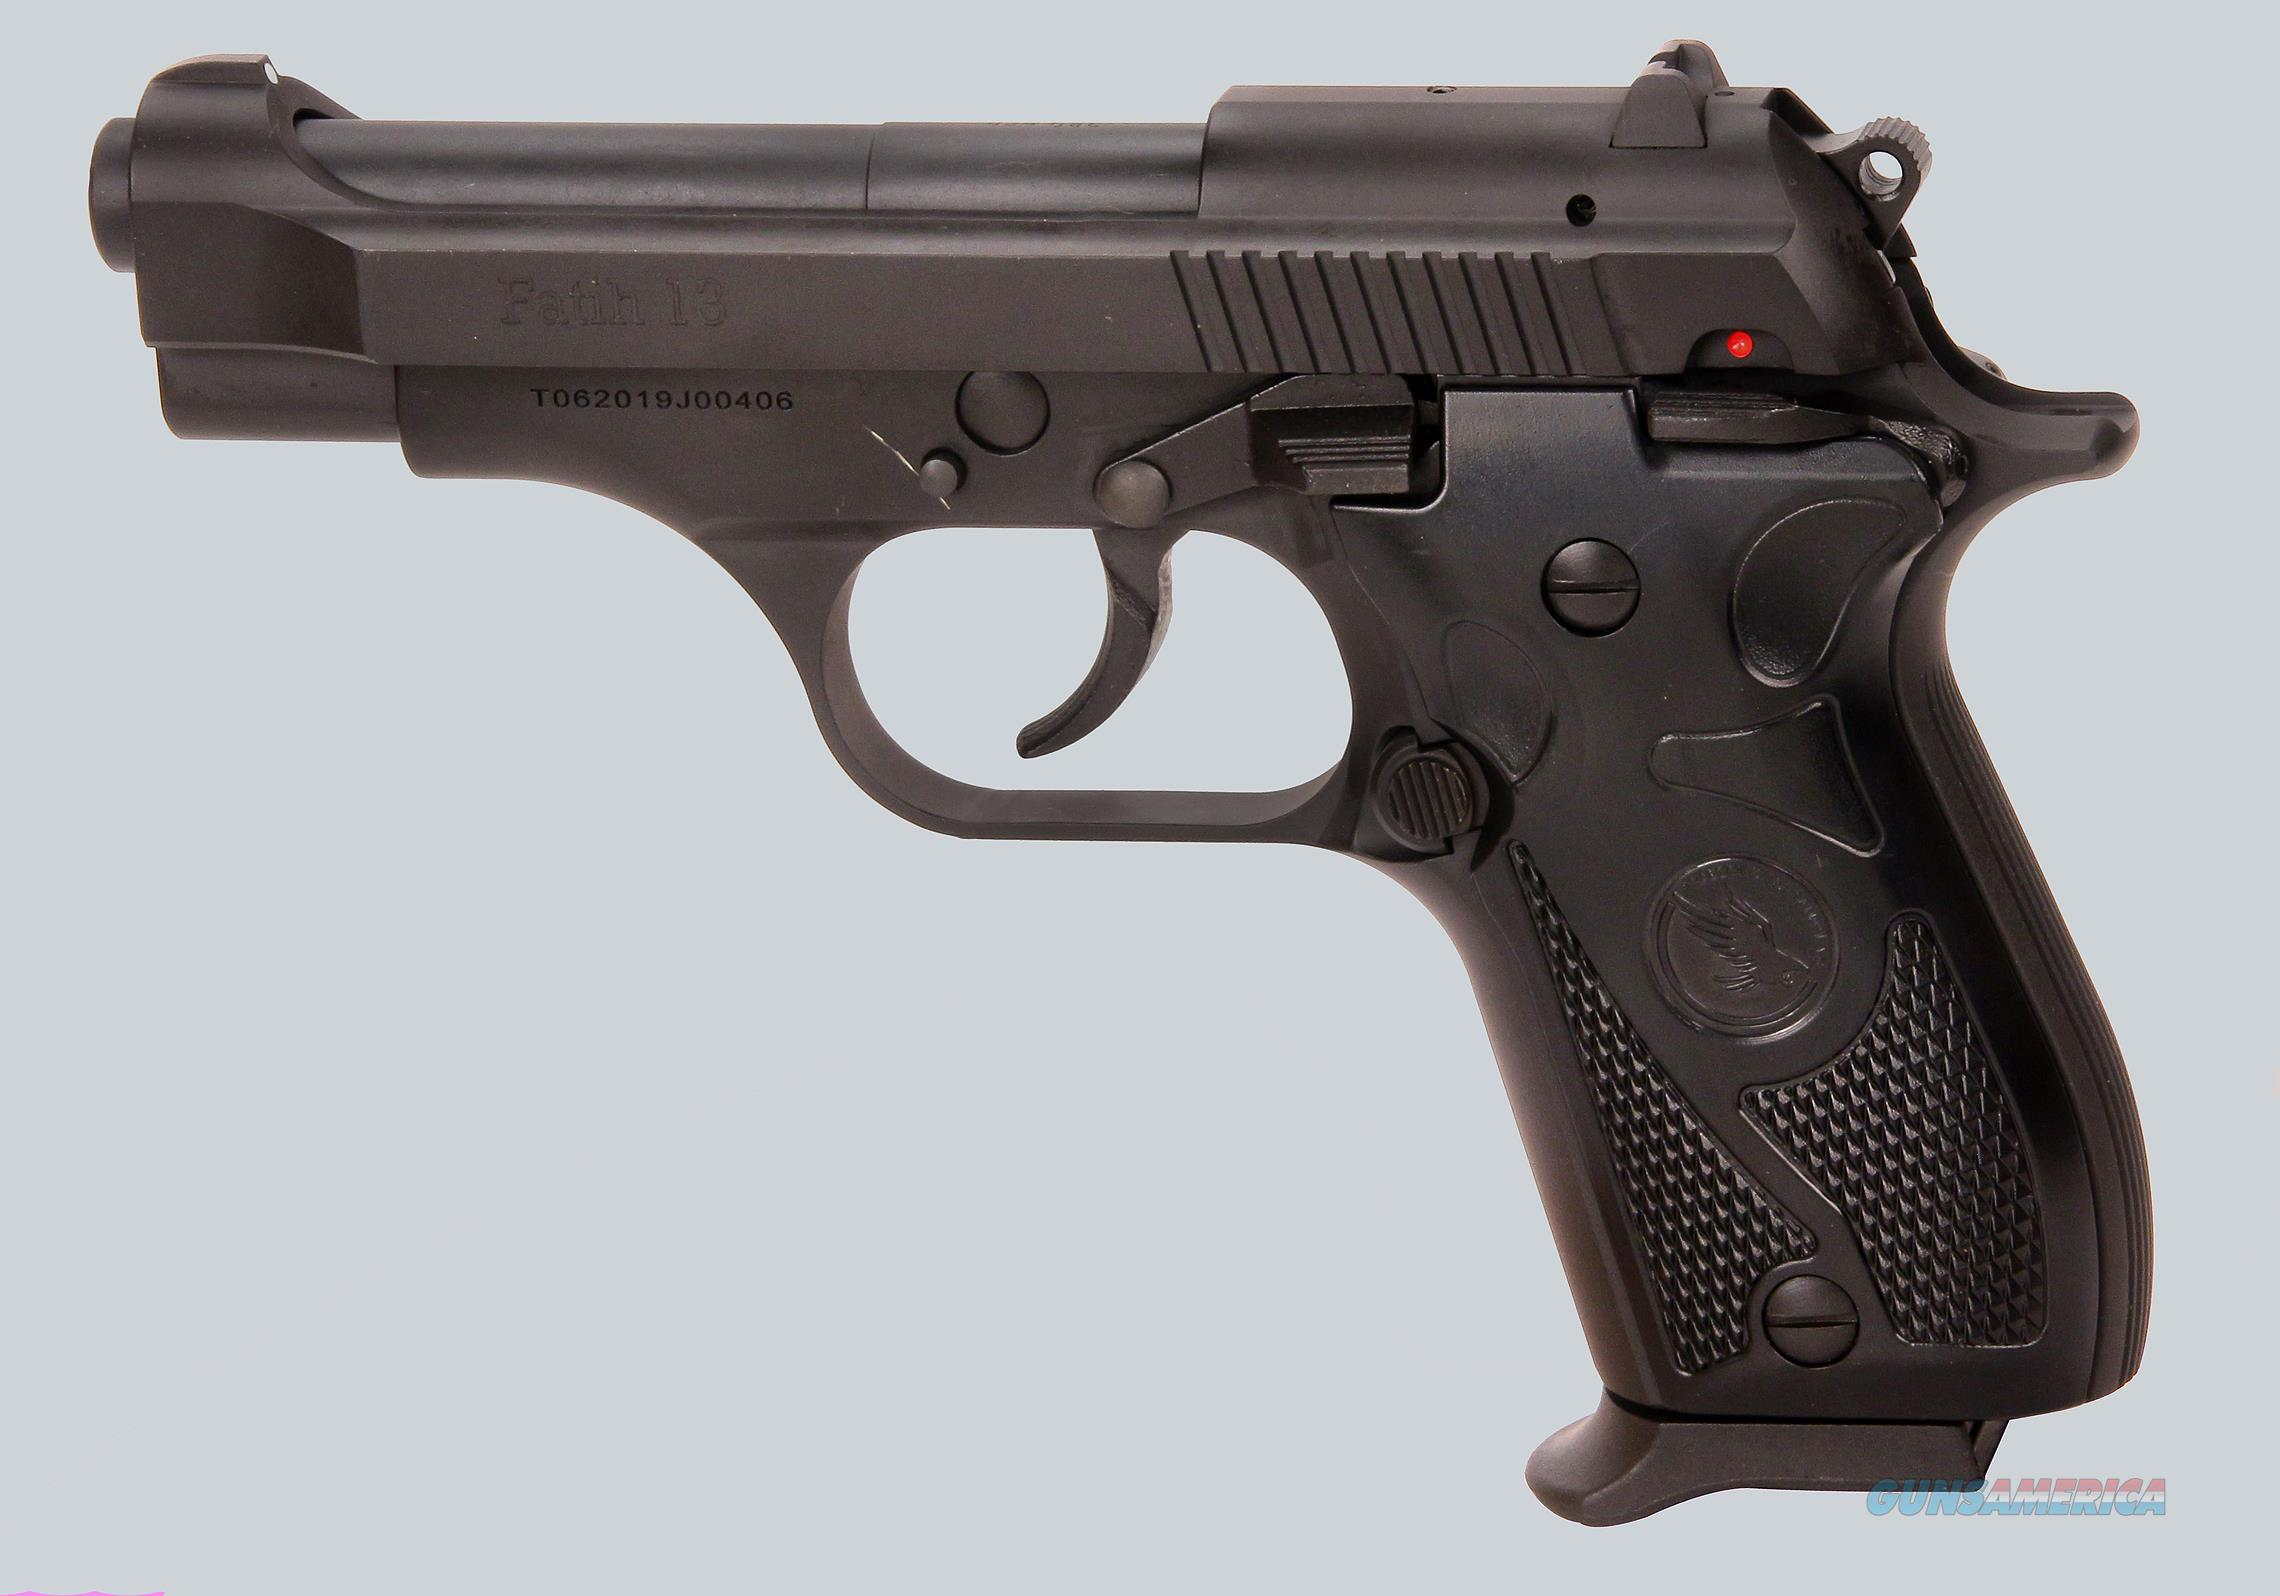 Tisas 380acp Model Fatih 13 Pistol  Guns > Pistols > TU Misc Pistols